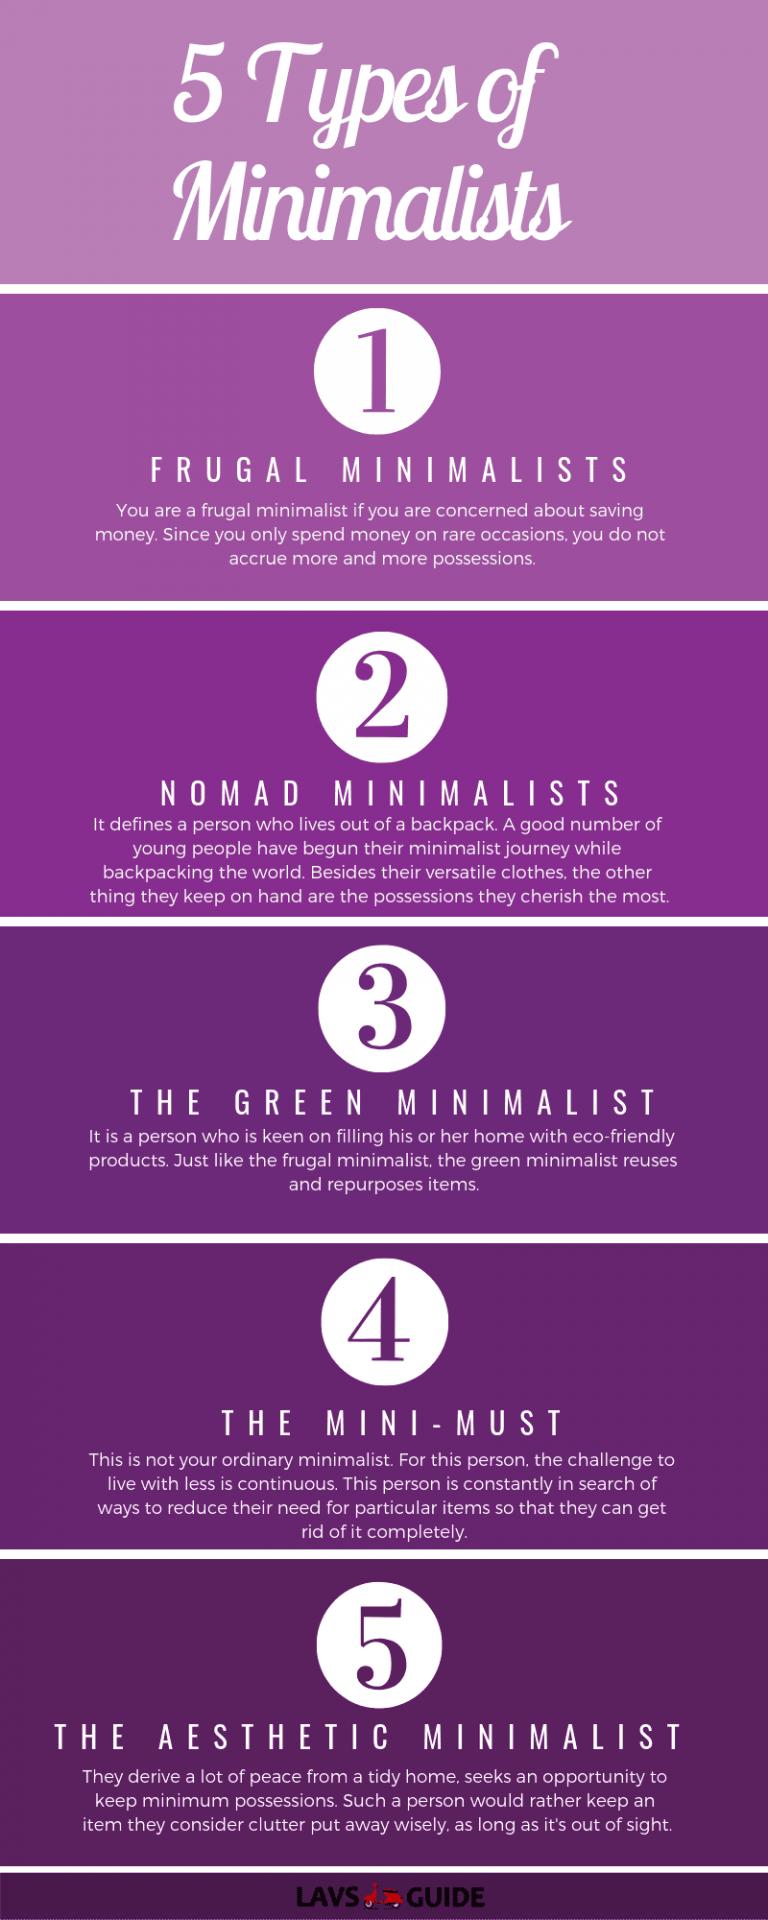 5 types of Minimalists